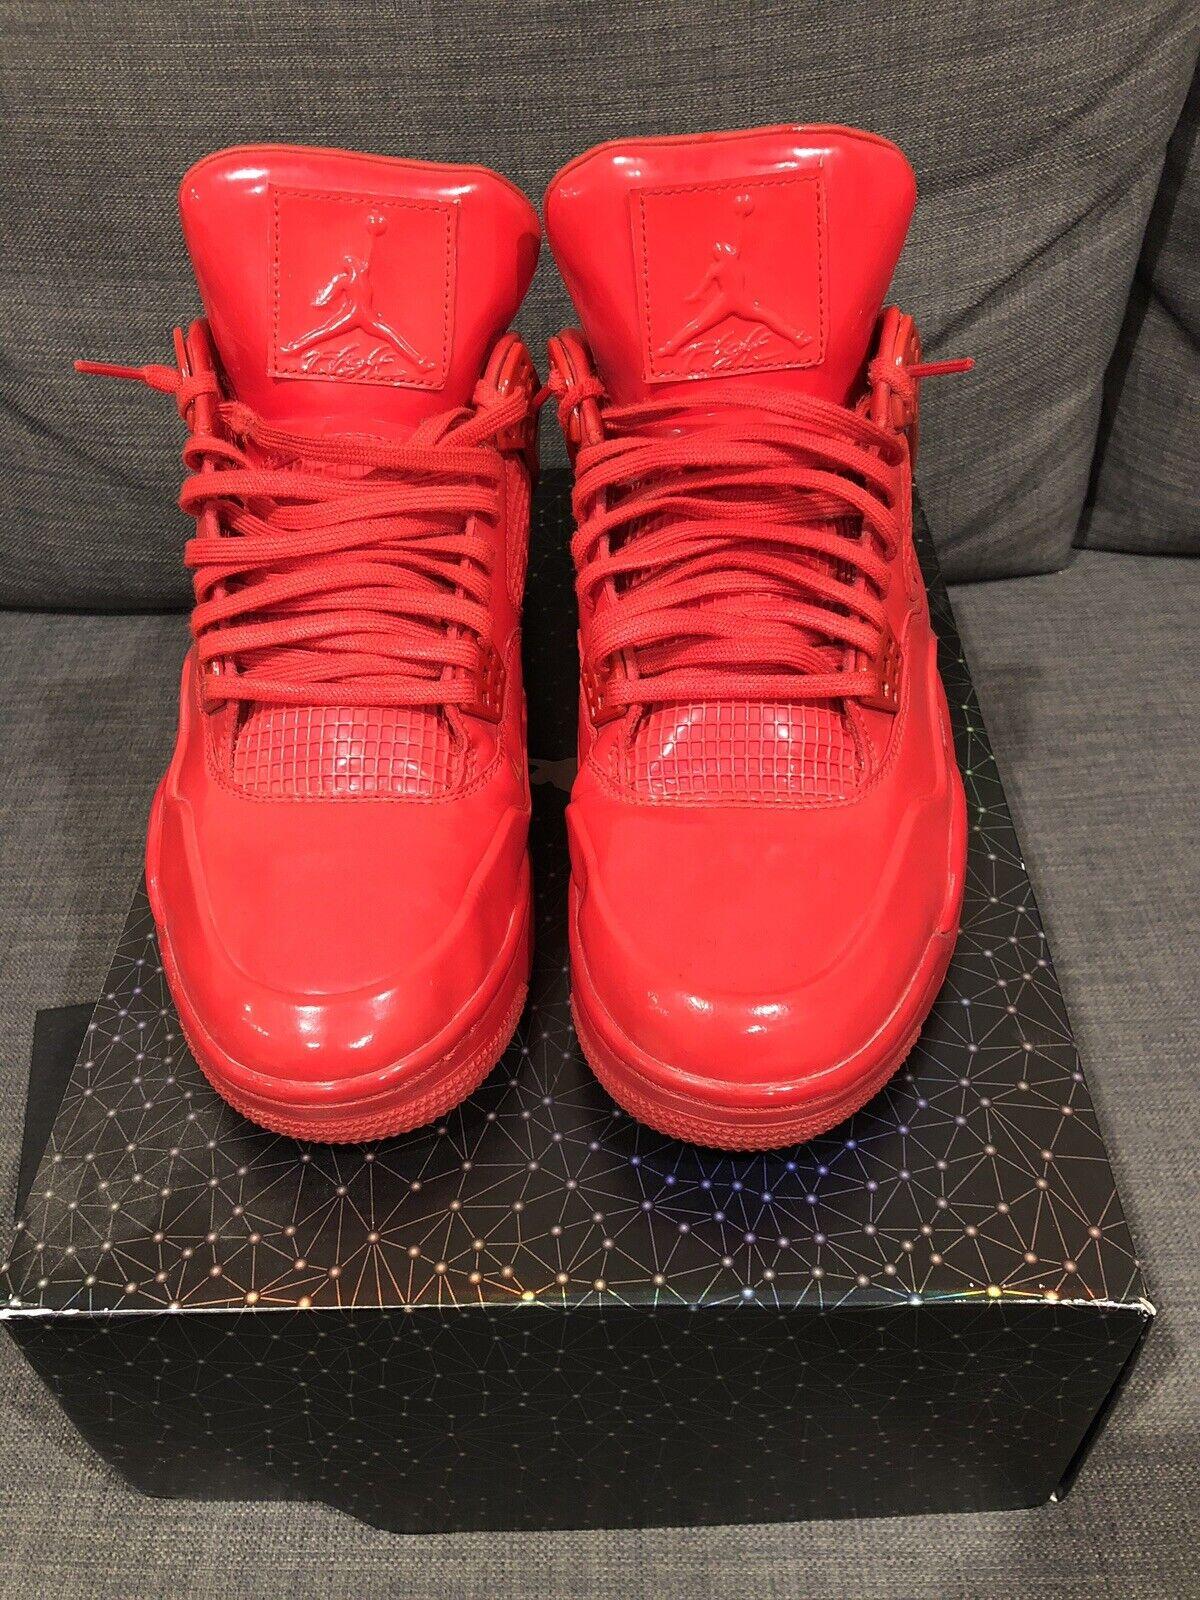 Nike Air Jordan 11 Lab4 University Red Size 12 Preowned